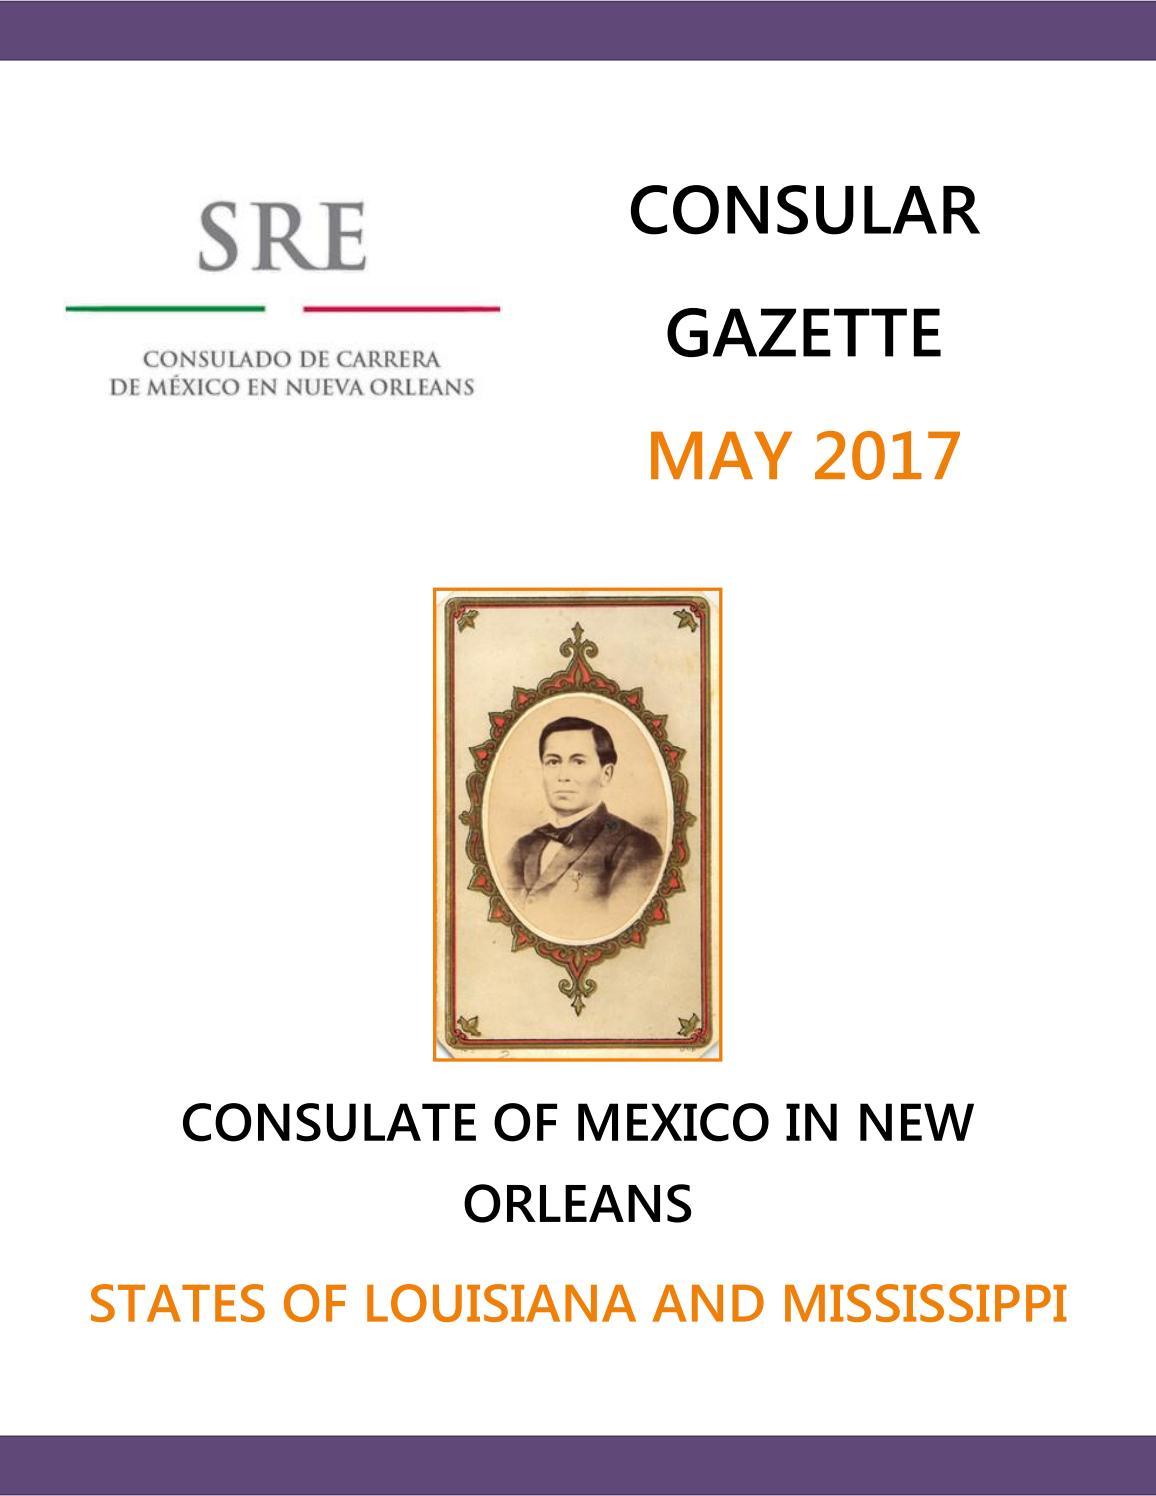 Consular Gazette May 2017 by Consulado de México en Nueva Orleans ...